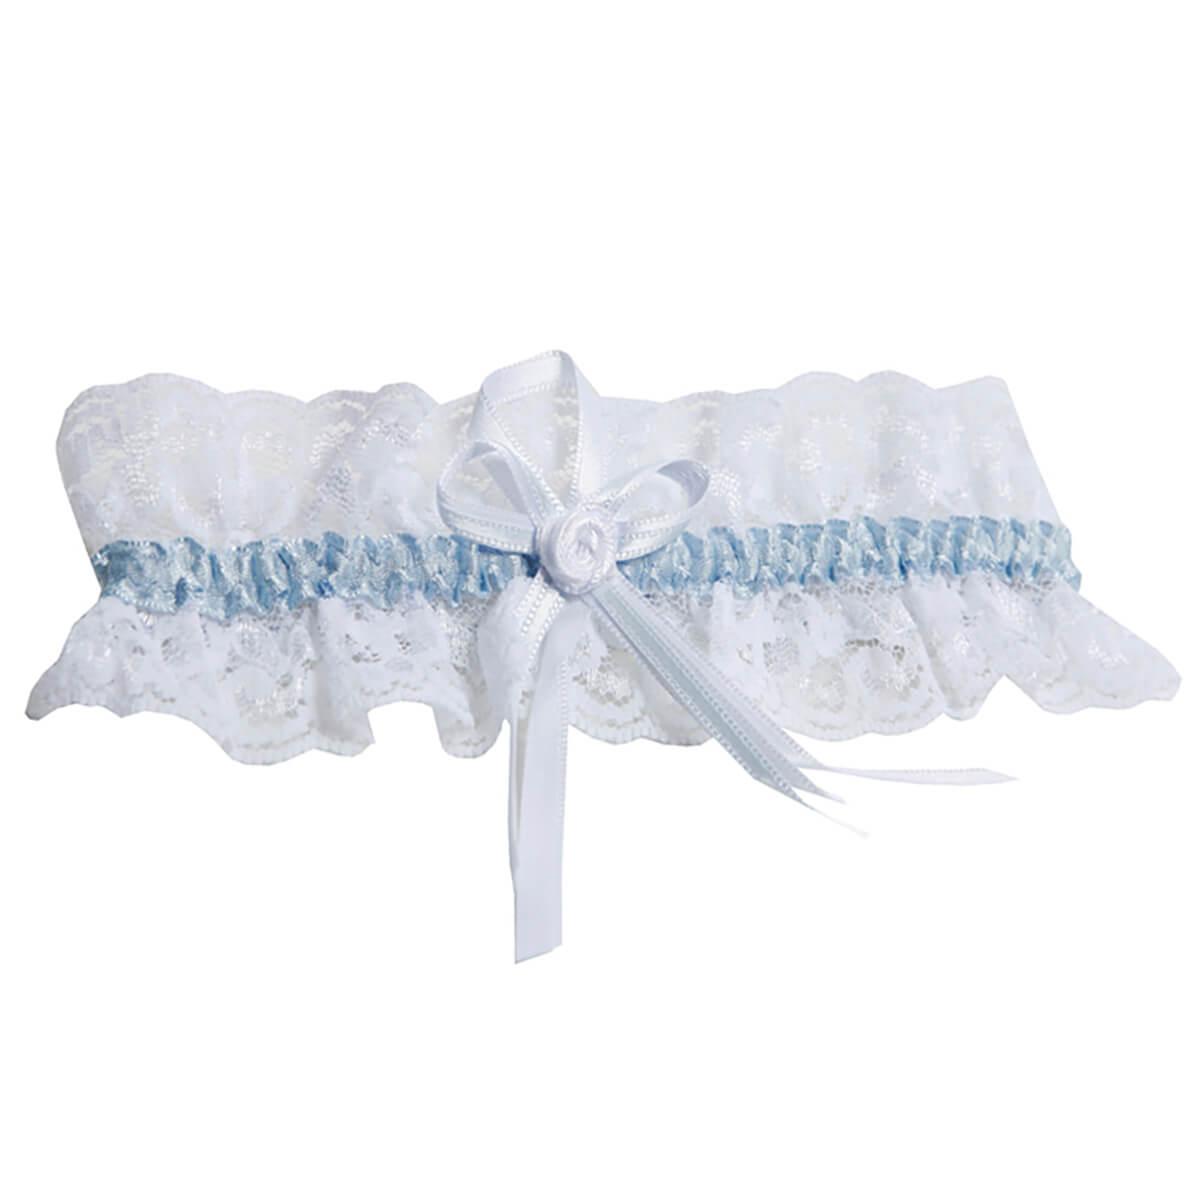 Miss Perfekt-Wow2Go, Strumpfband breit 5cm - Weiß/Blau